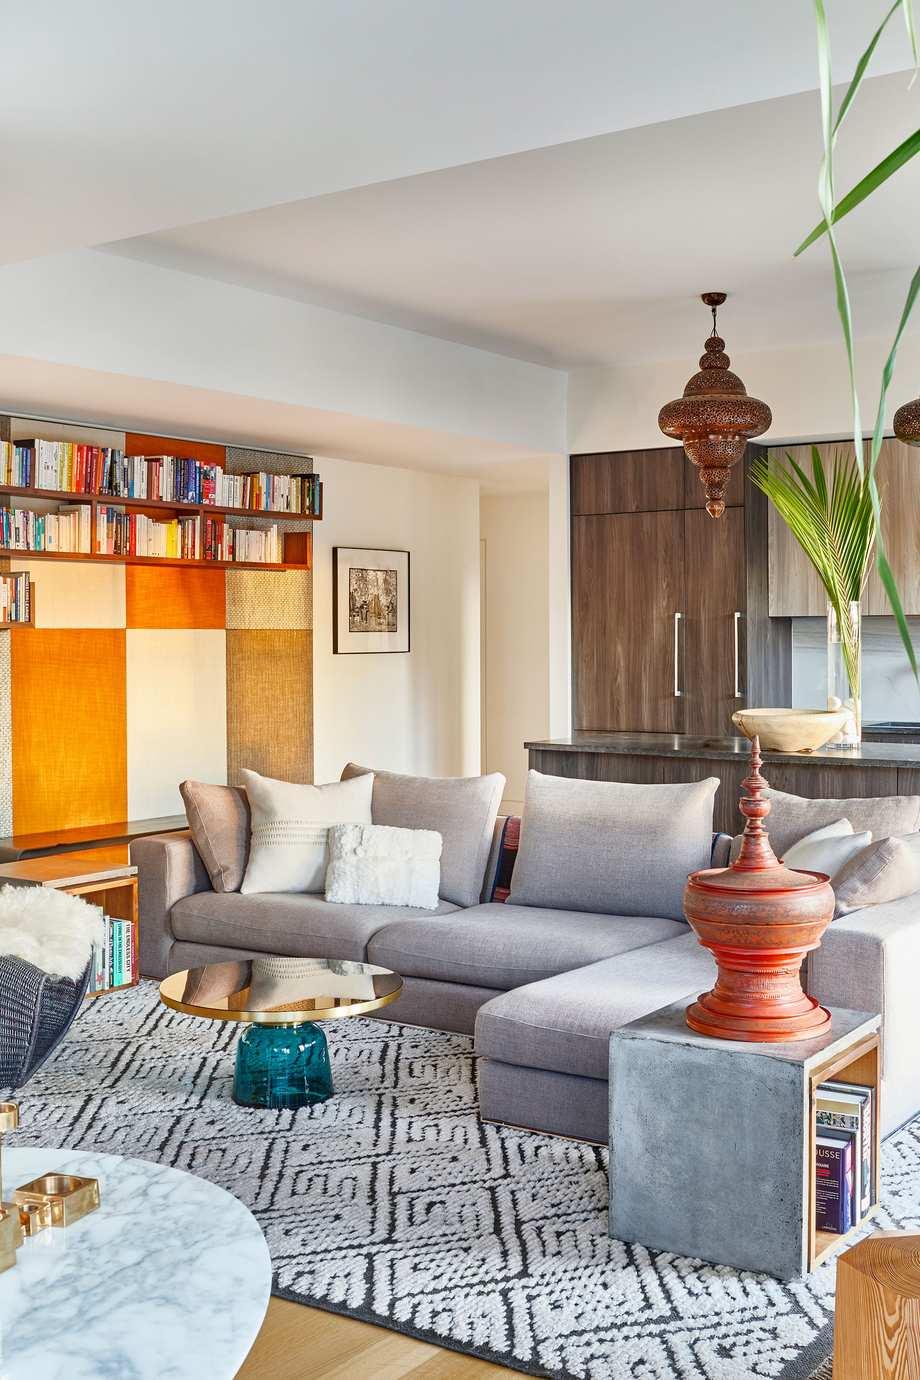 Latest Interior Design For Living Room: Timeless Décor For A New-Renovation Condo